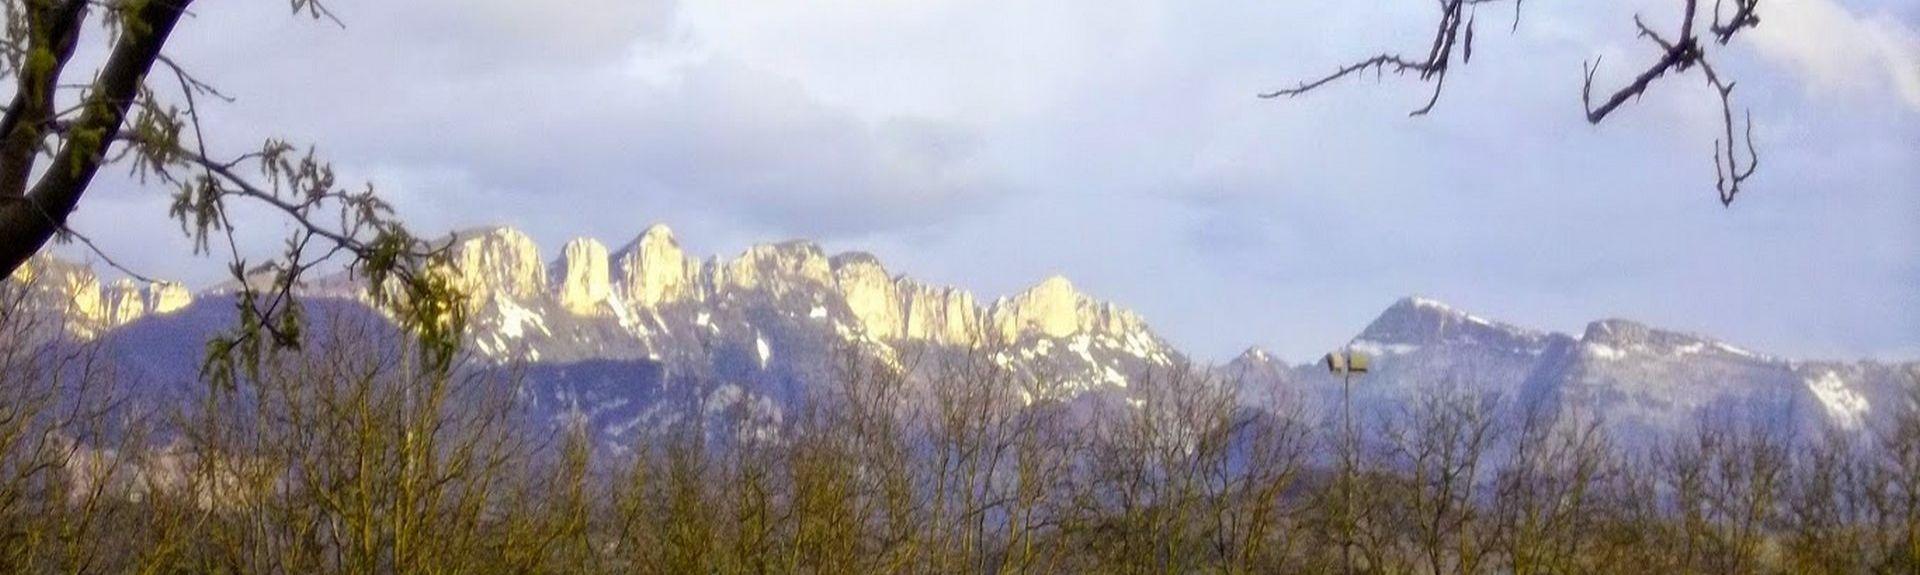 Saint-Marcel-lès-Valence, Auvergne-Rhône-Alpes, France